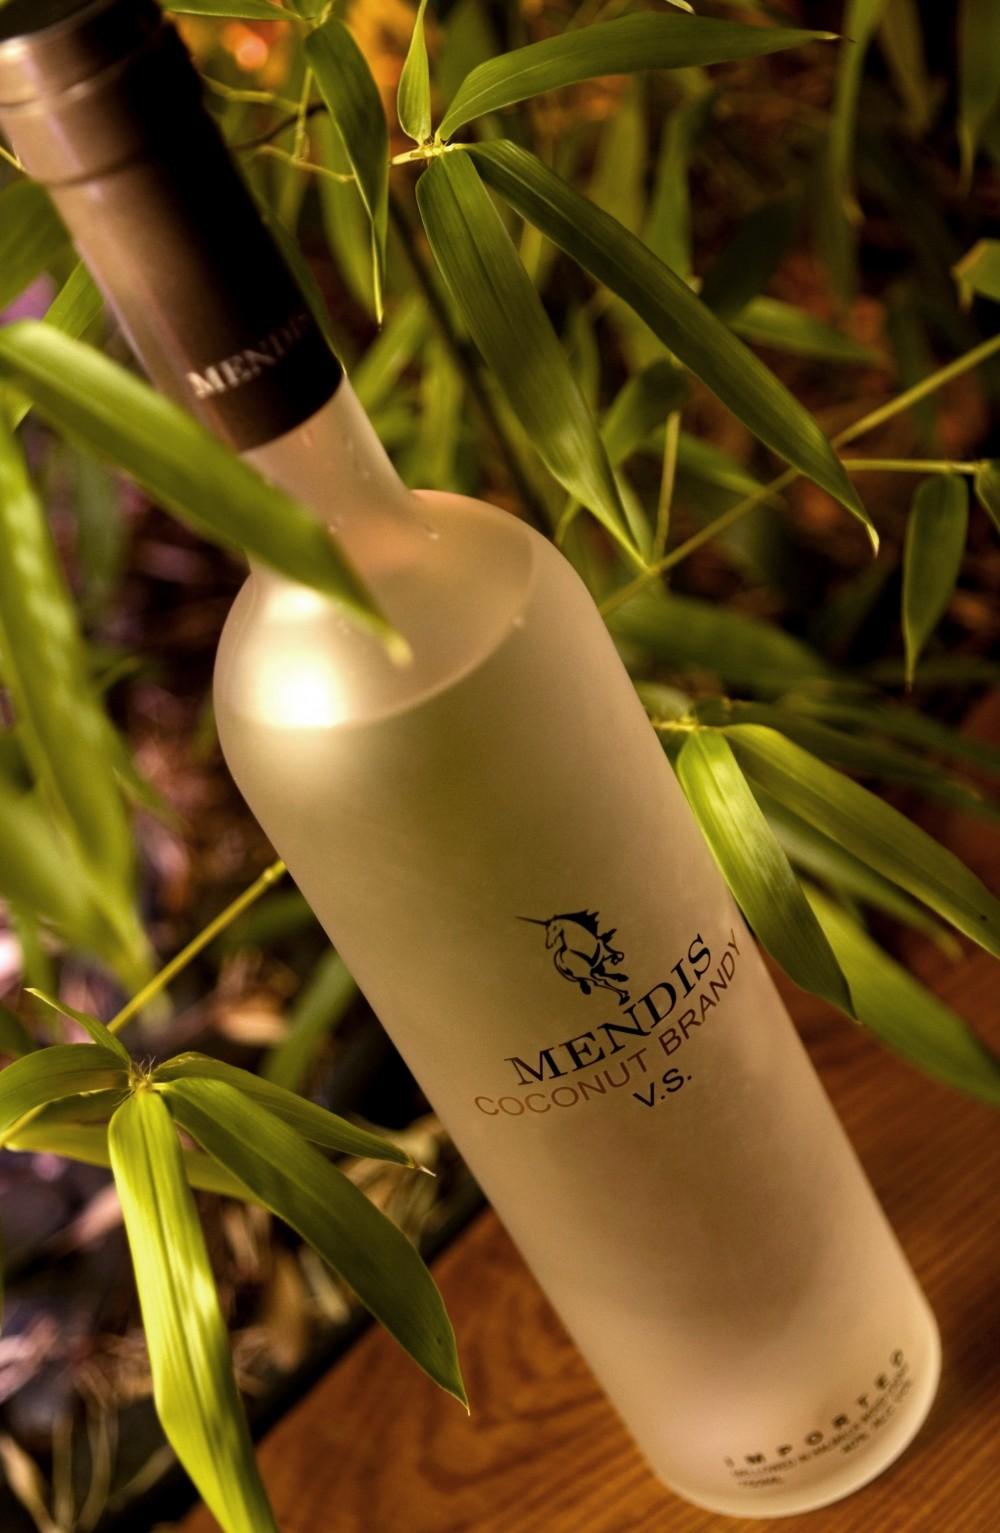 11. Mendis Coconut Brandy – $1 миллион.